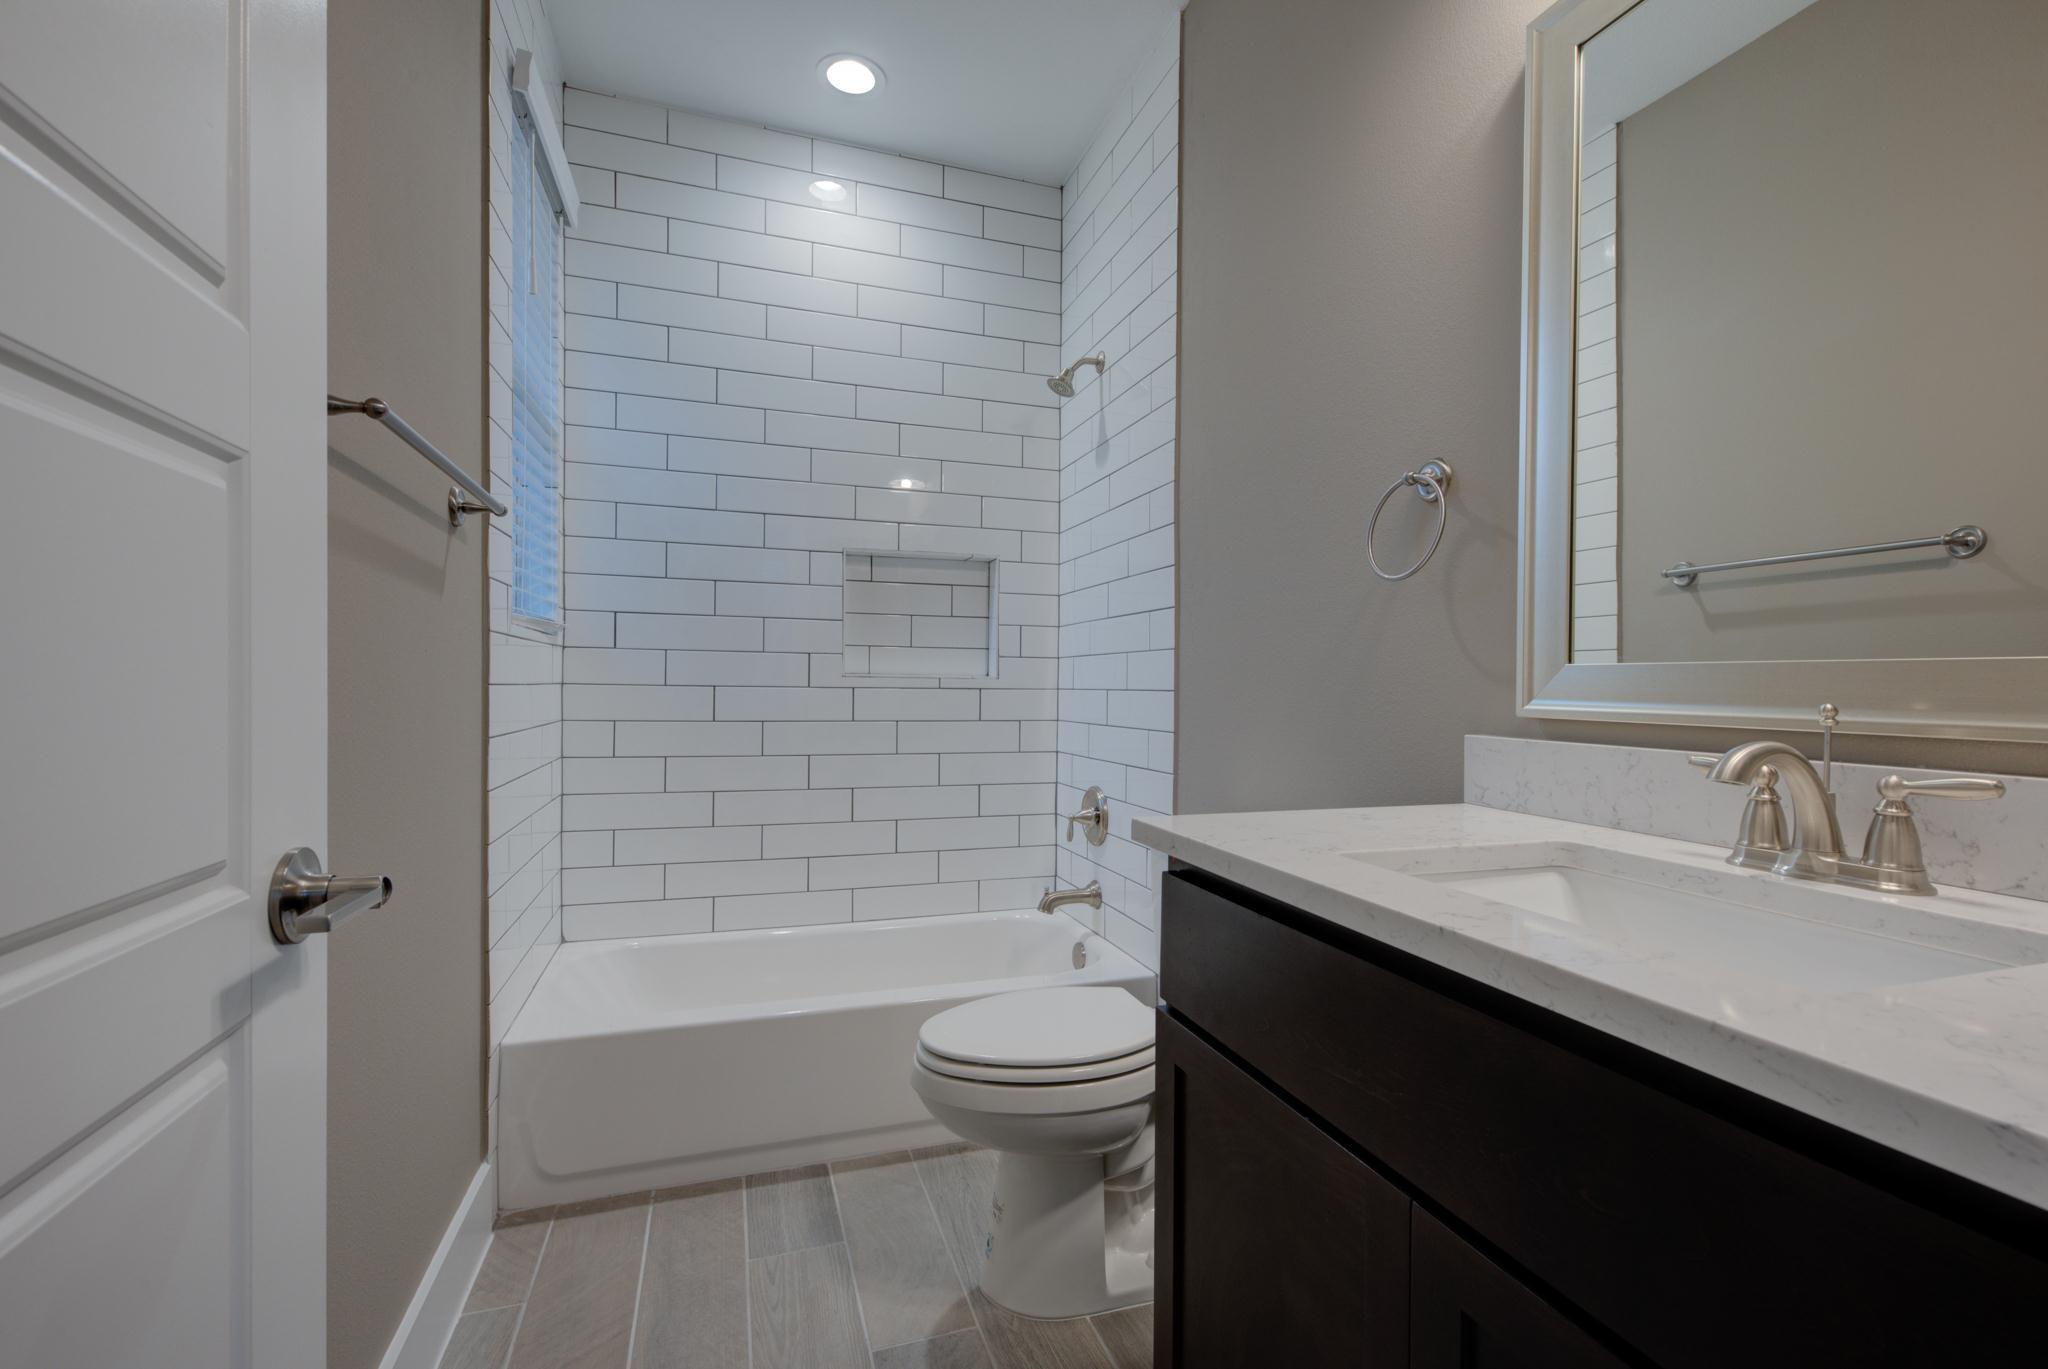 Bathroom featured in the Hamilton Creek By Casina Creek Homes, LLC in San Antonio, TX